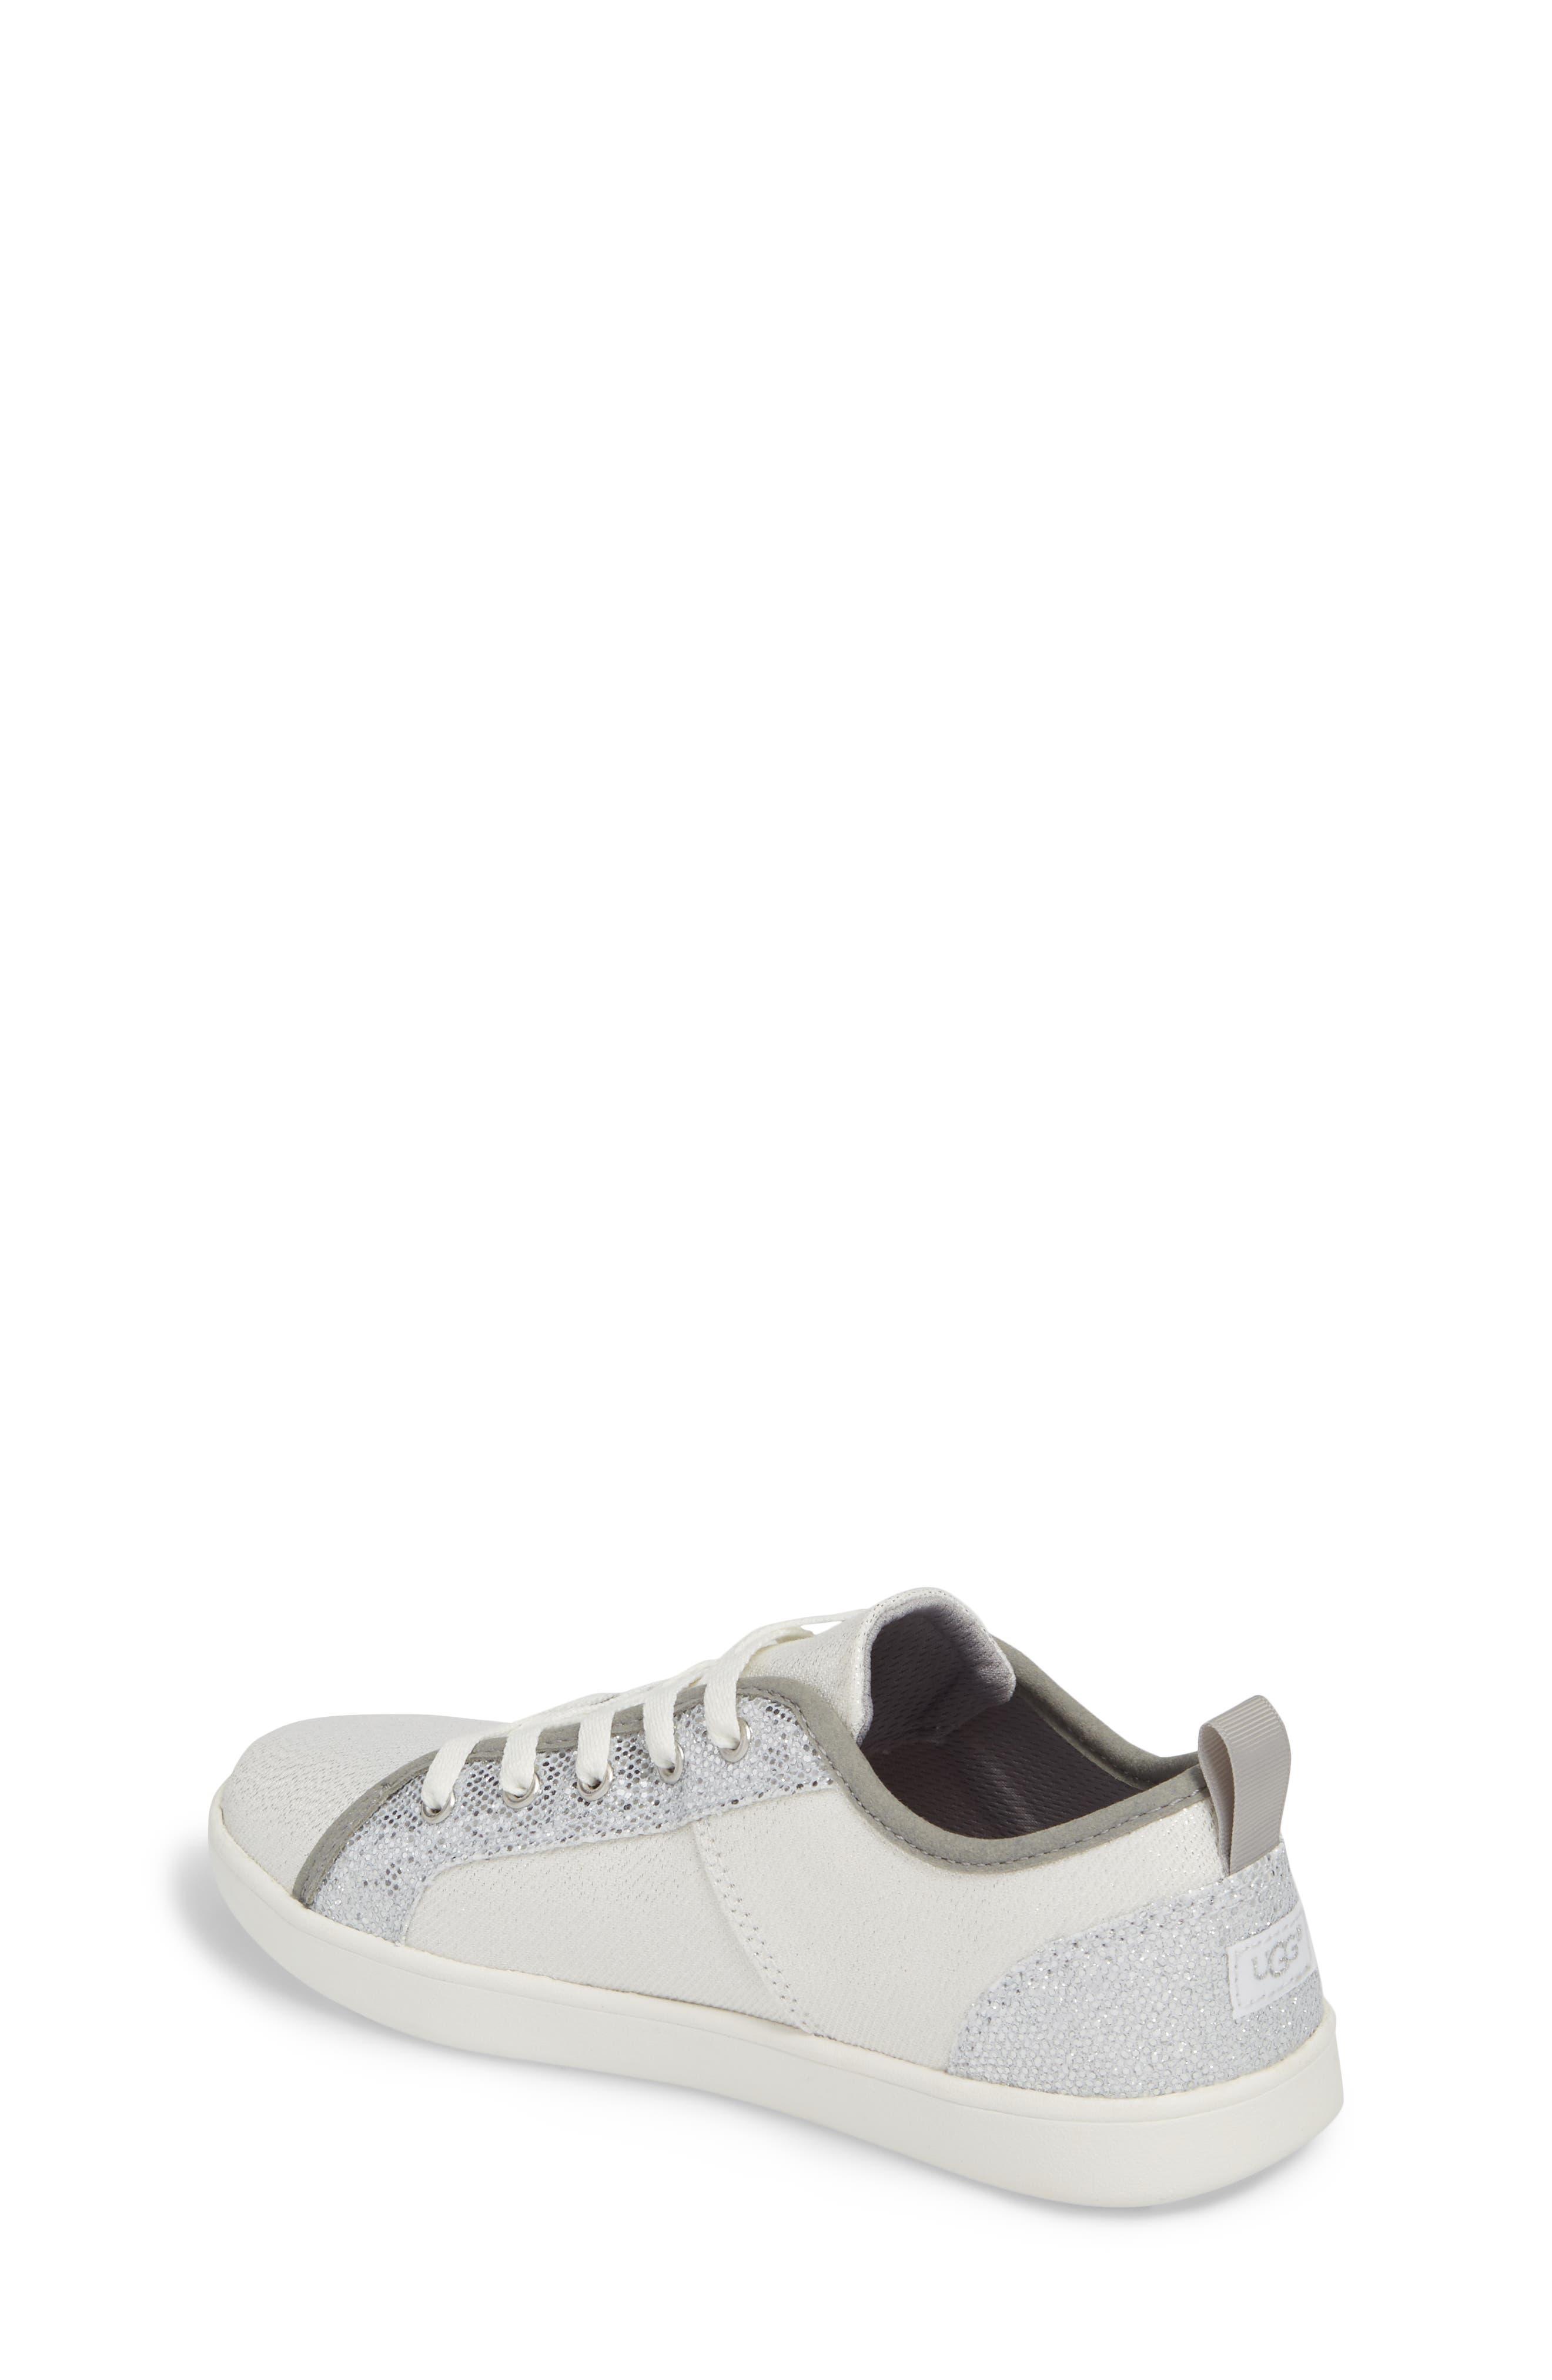 Irvin Sparkles Metallic Sneaker,                             Alternate thumbnail 2, color,                             Silver